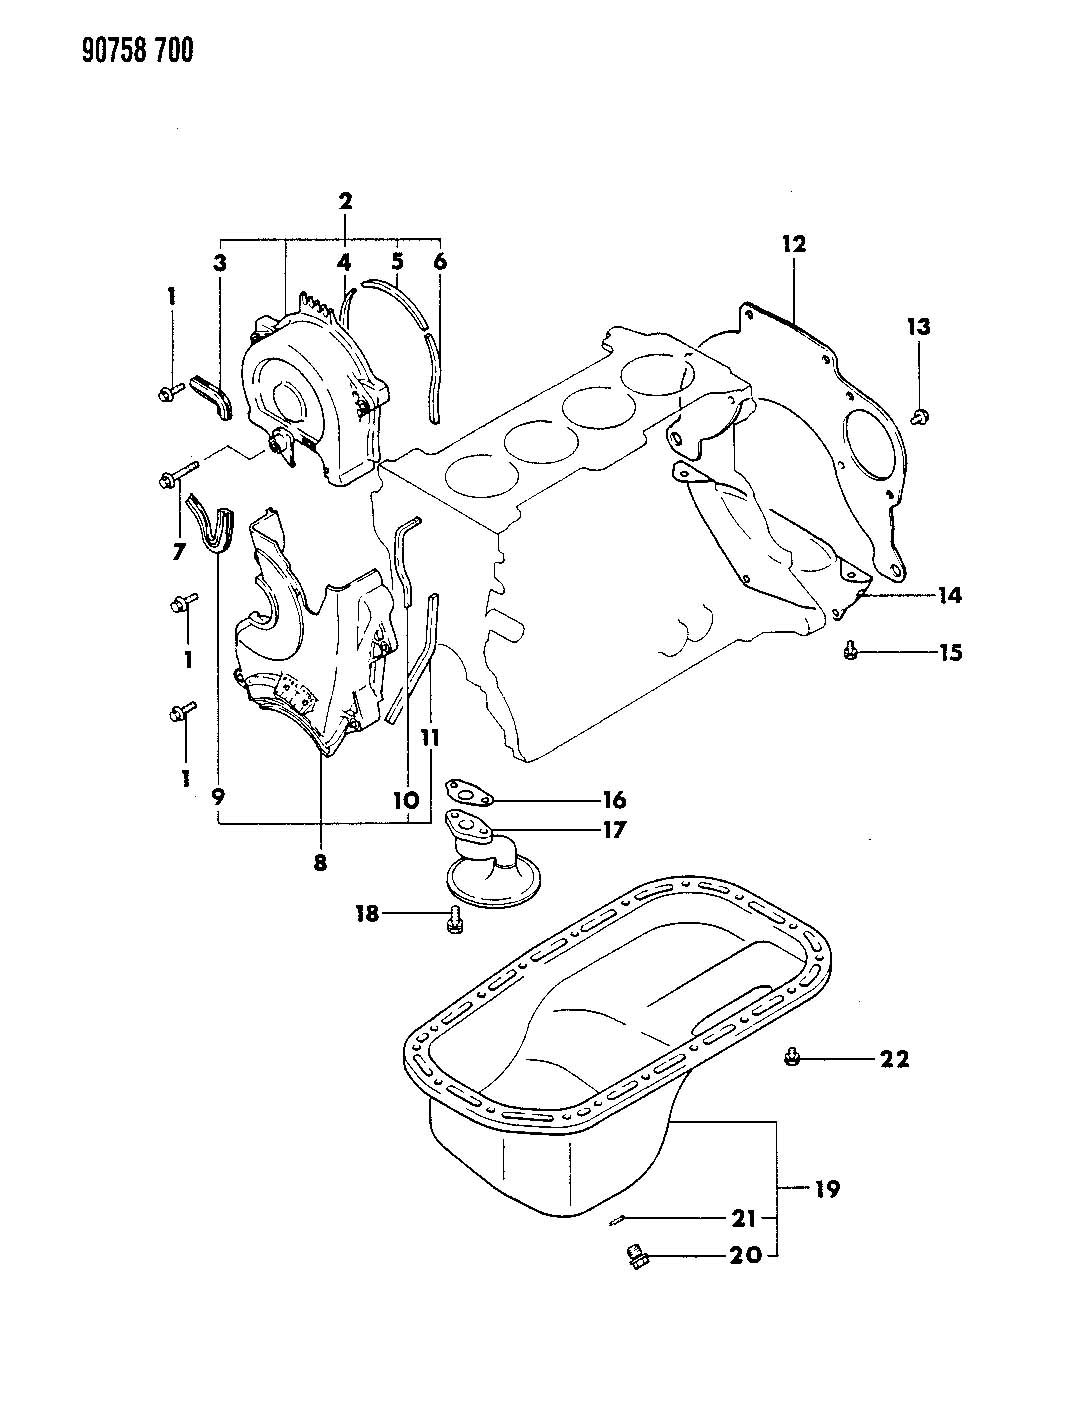 Chrysler Sebring Bolt. Hex flange head. M6x18. Timing belt